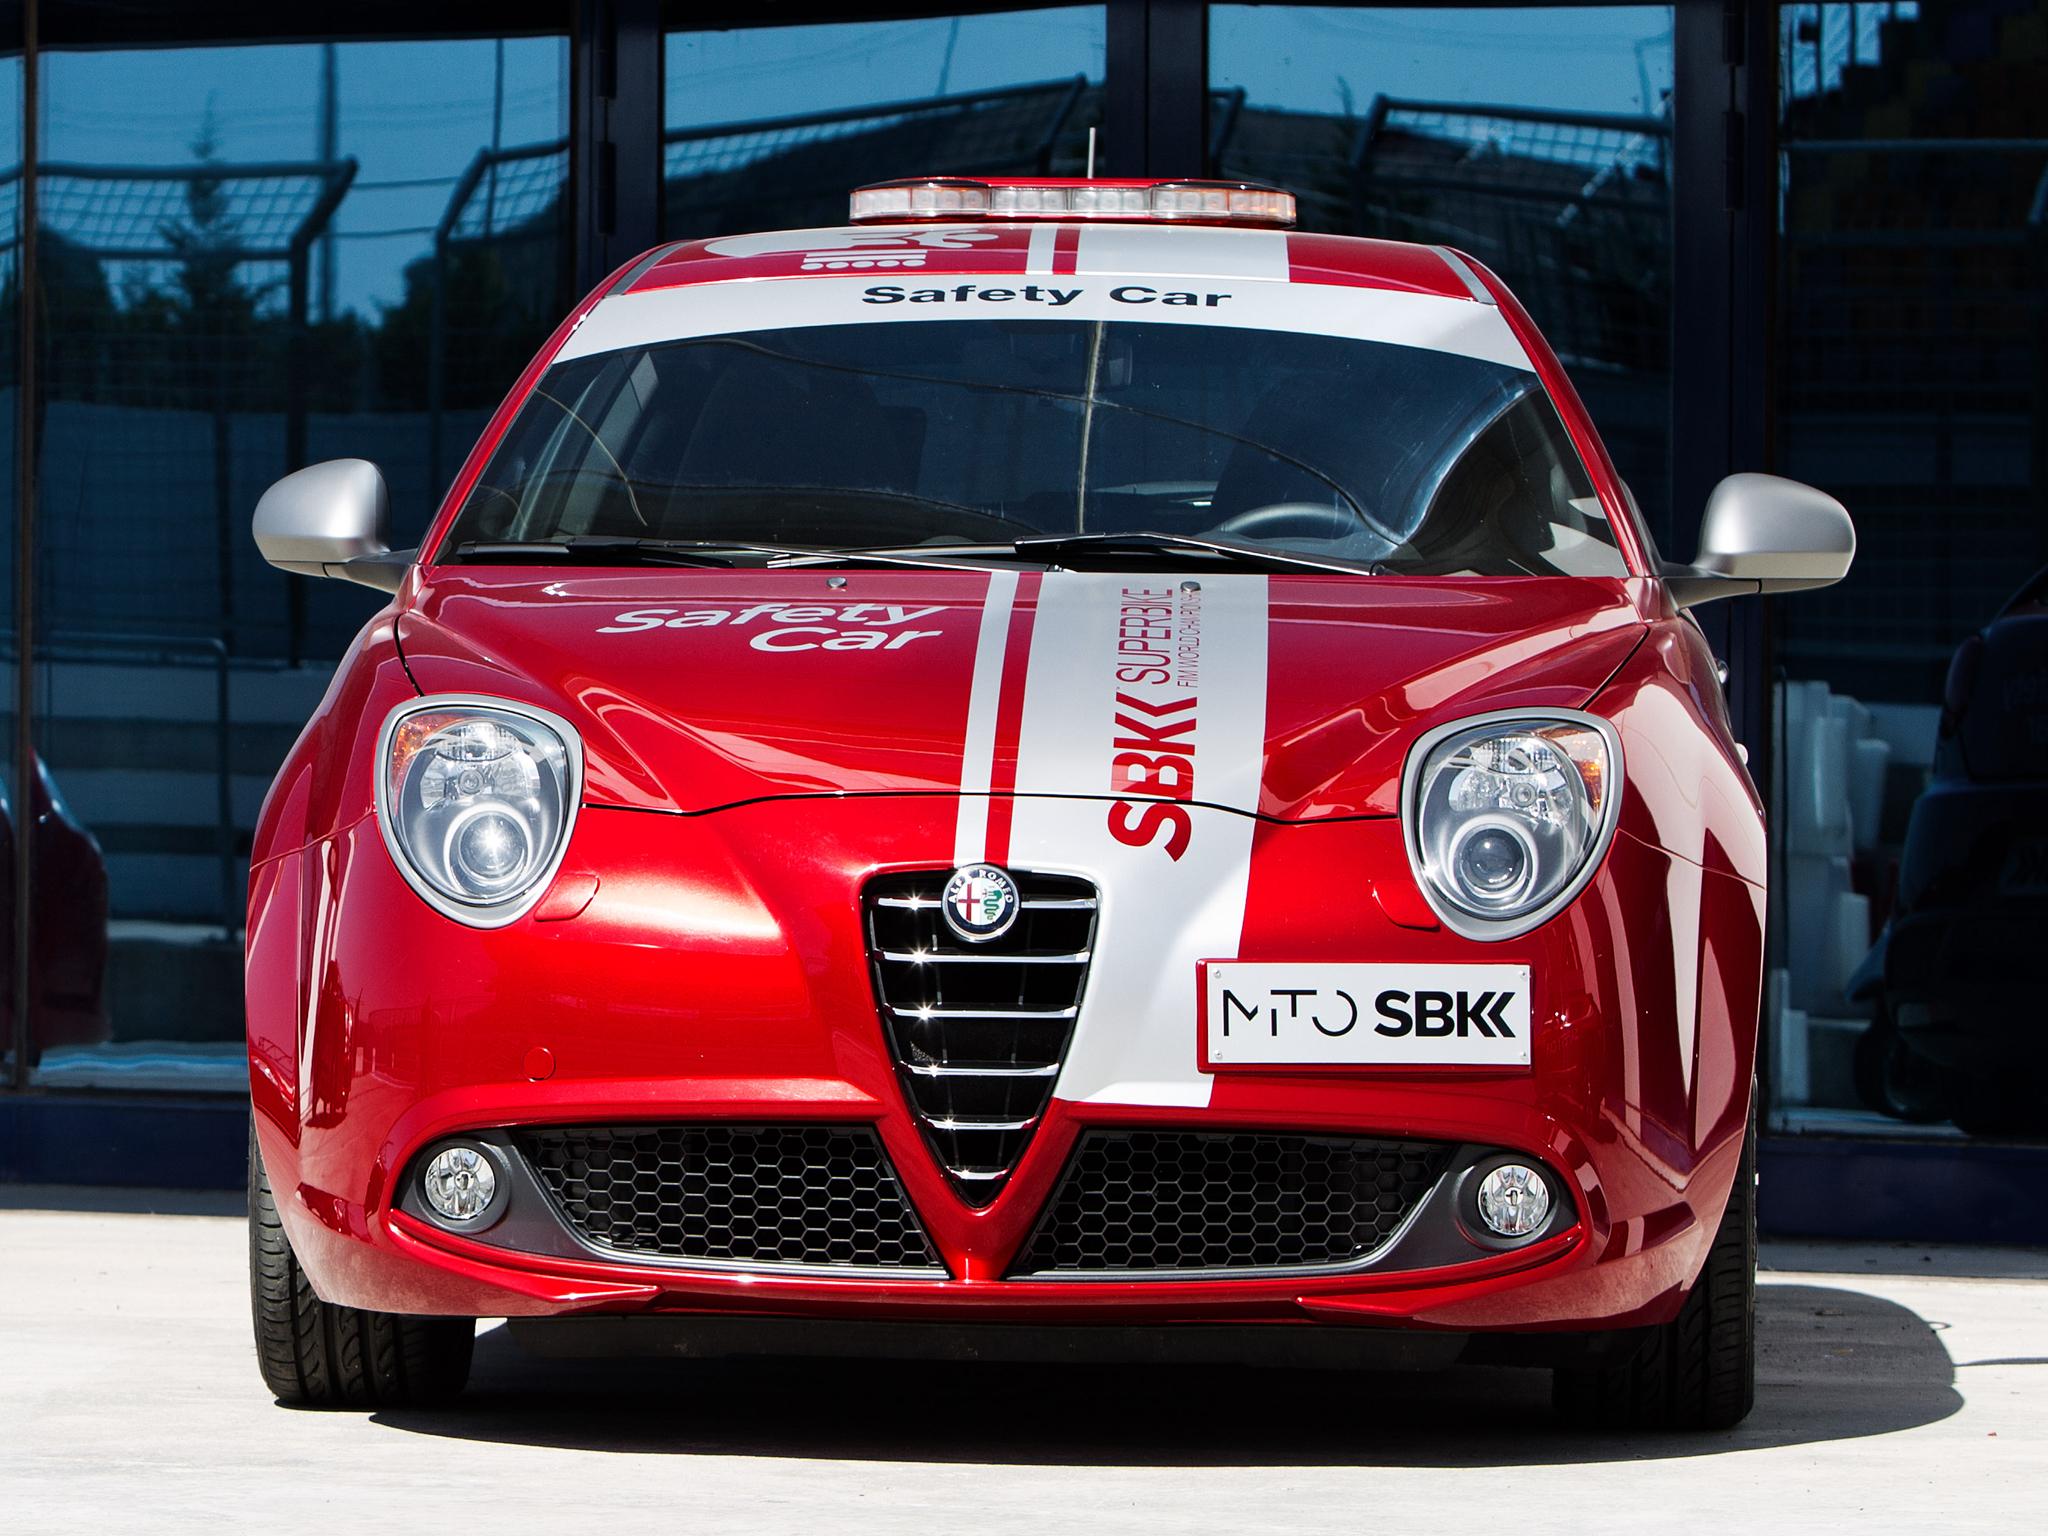 2013 Alfa Romeo MiTo Quadrifoglio Verde SBK Safety Car 955 tuning race racing ew wallpaper